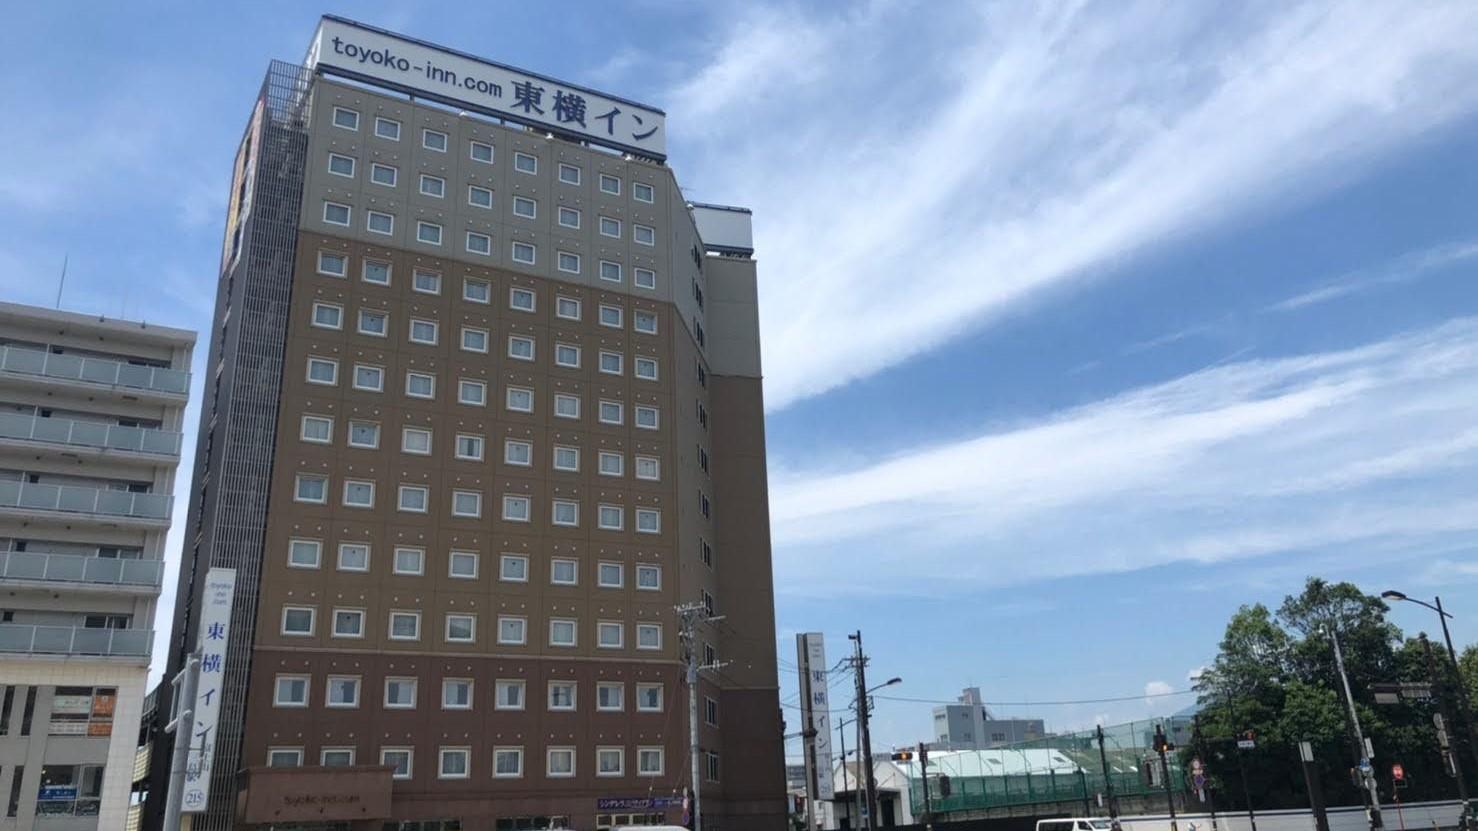 東横イン富士山三島駅 image